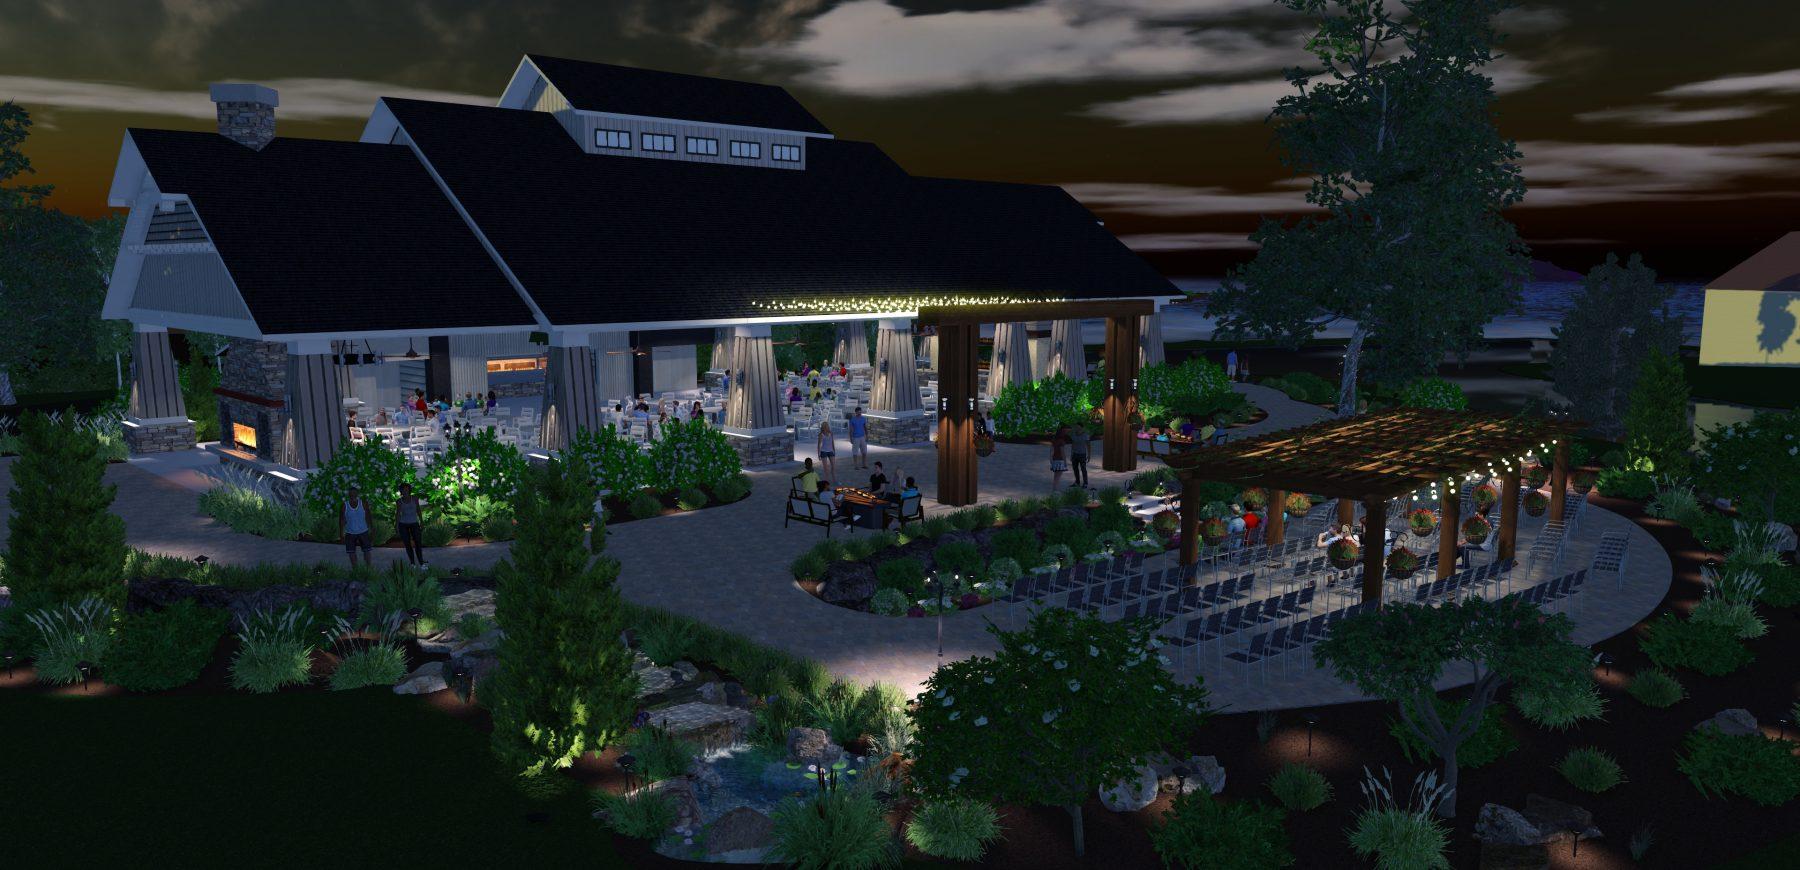 Madden's Event Pavilion